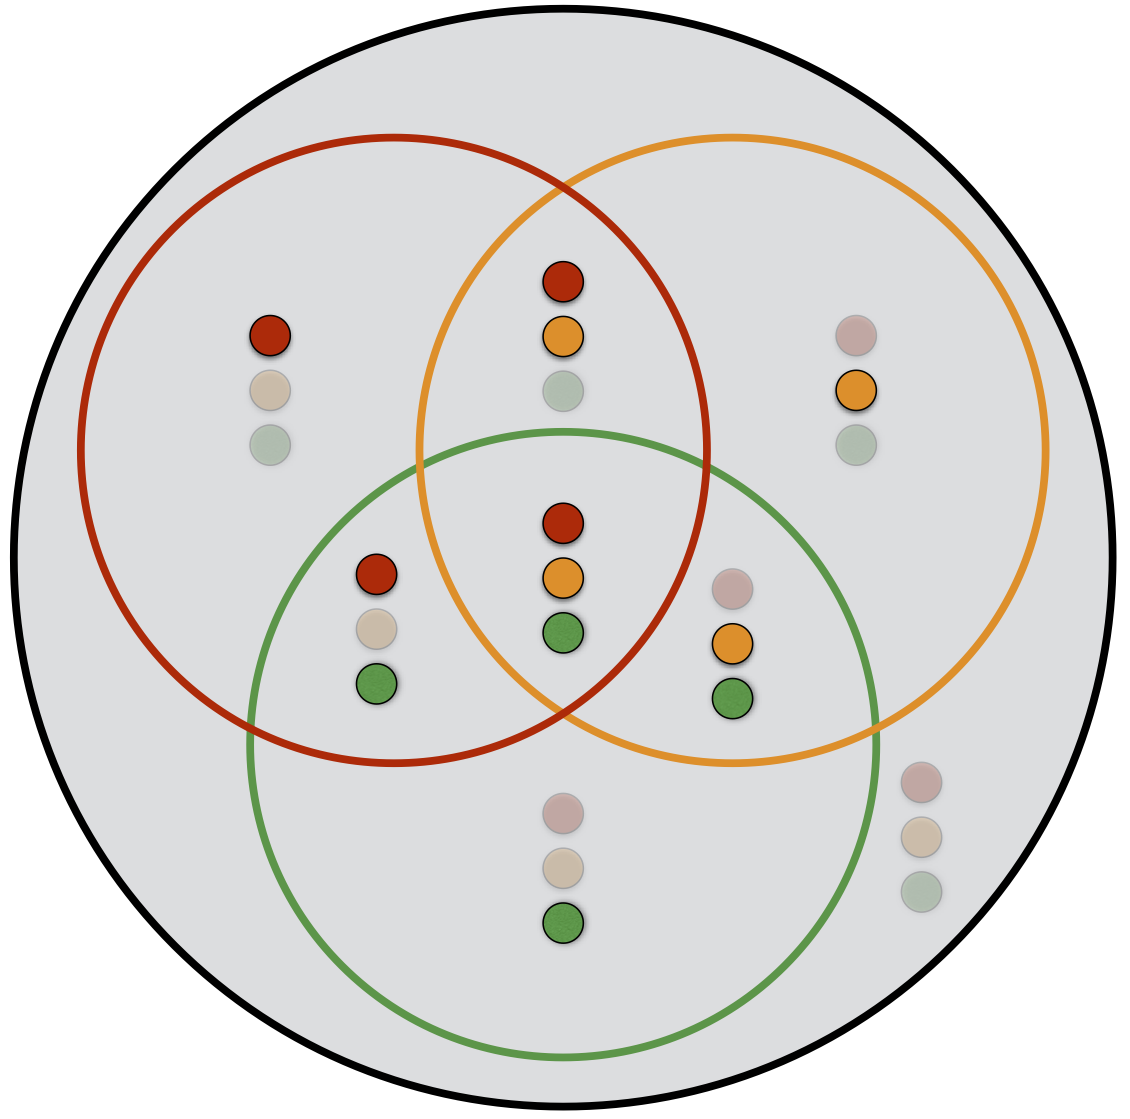 Venn diagrams venn diagram key pooptronica Image collections